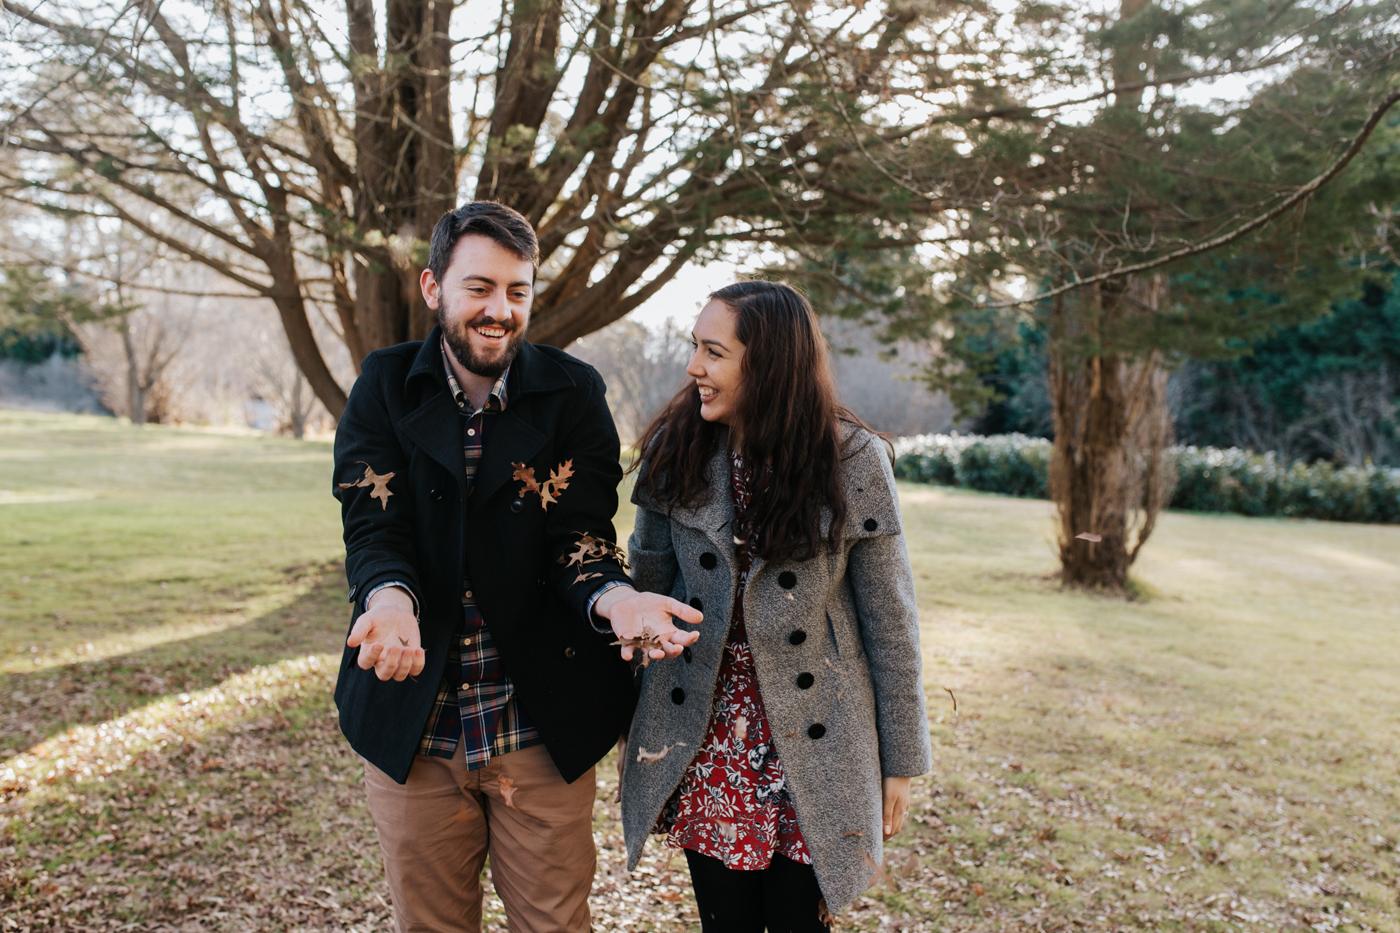 Kate & Kieran - Southern Highlands Engagement - Samantha Heather Photography-29.jpg